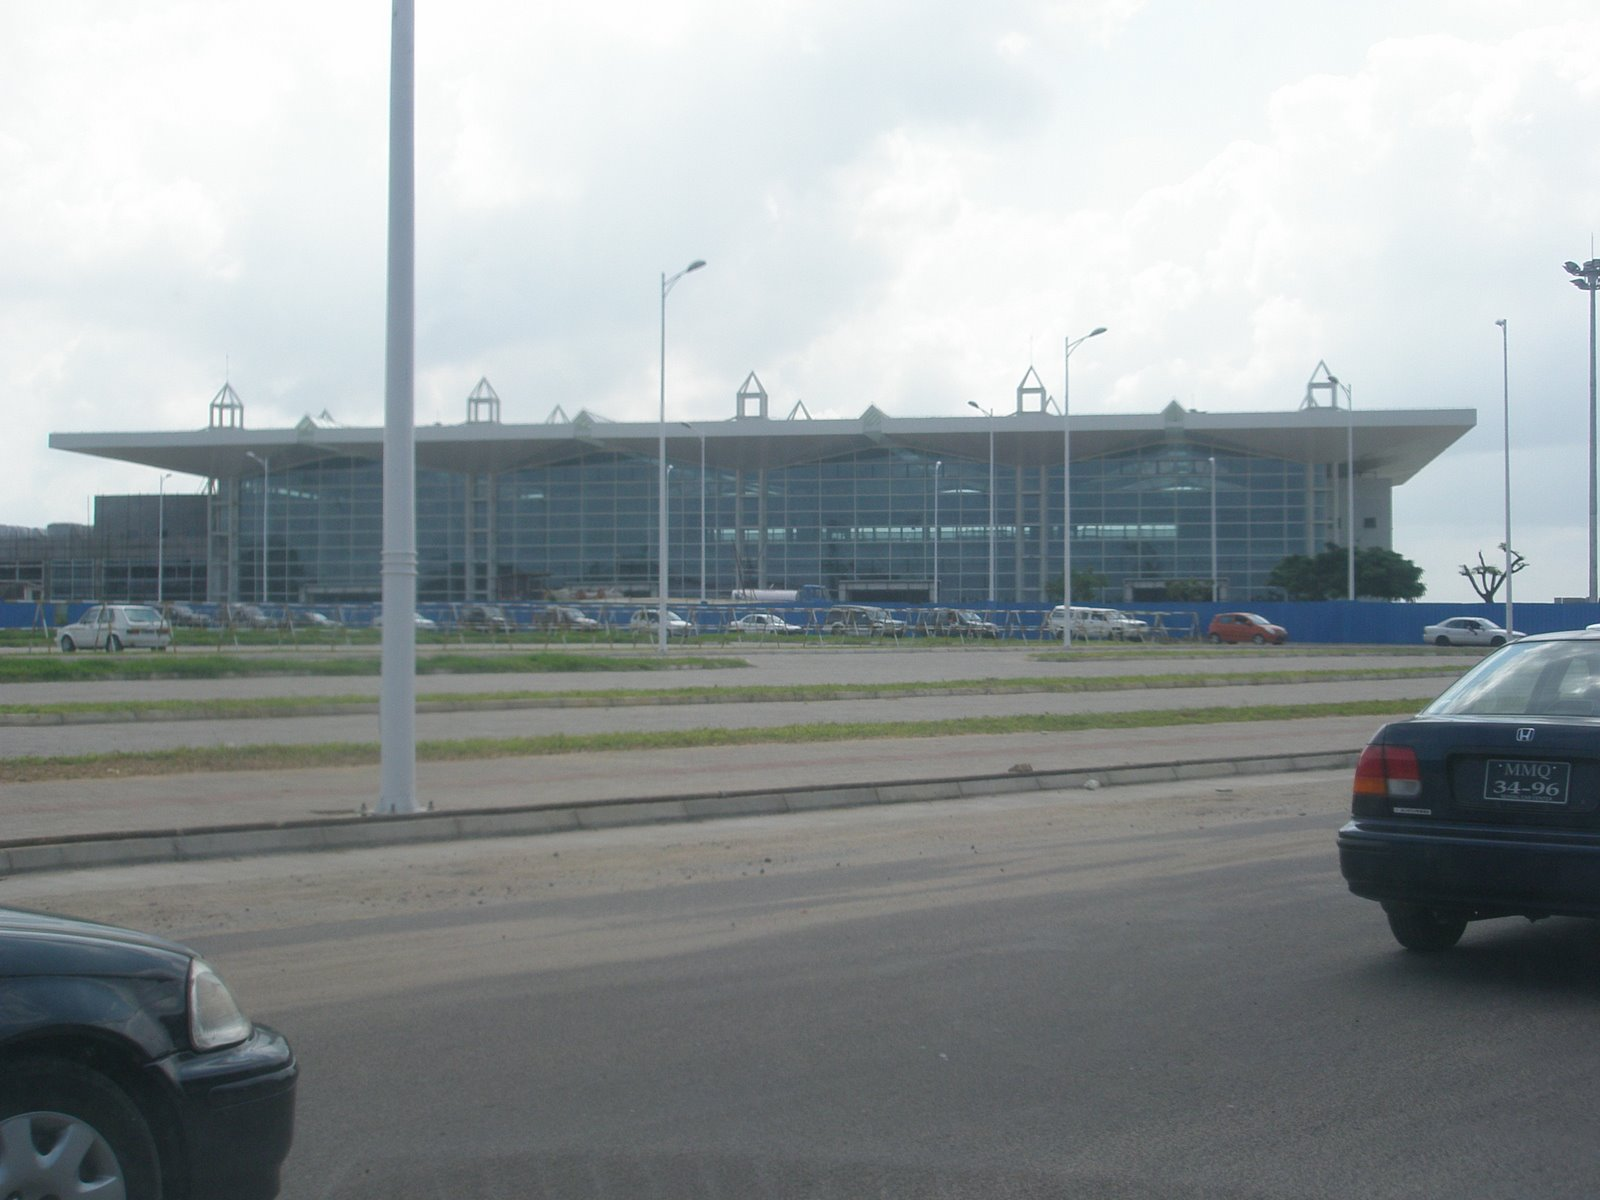 Aeroporto De Quelimane : Digital no Índico maputo imagem novo aeroporto em fase